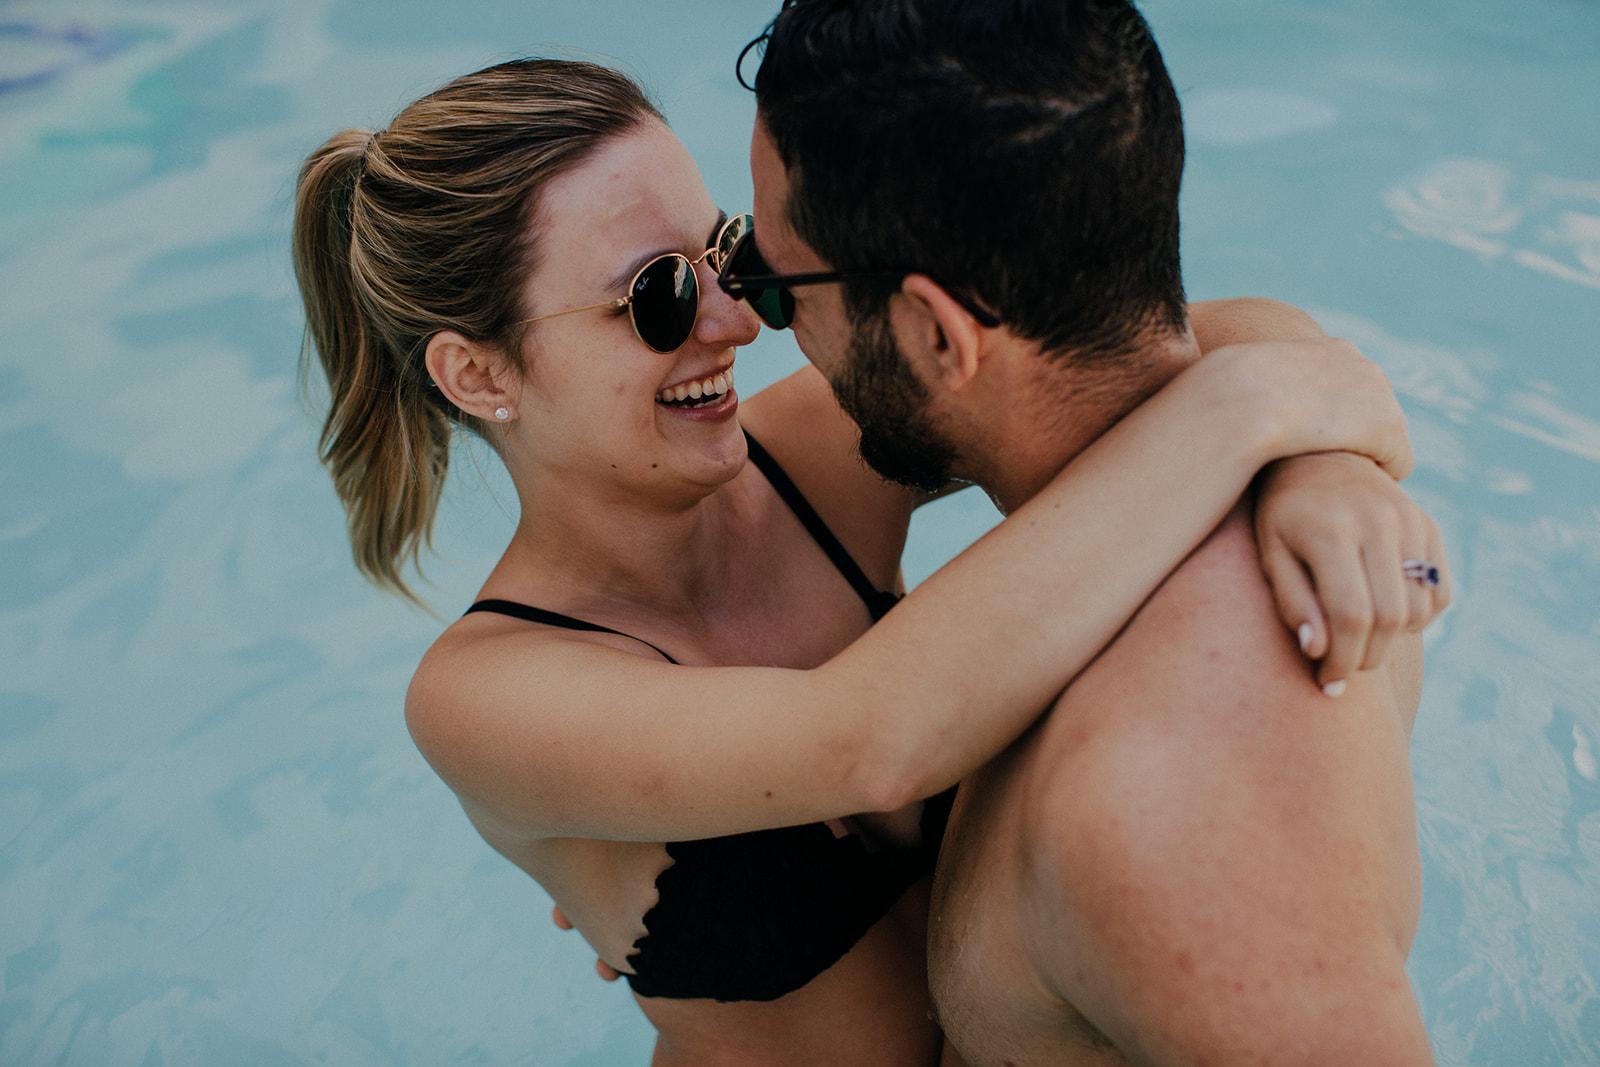 Kayla & Mickey's Poolside Love - Phoenix, AZ